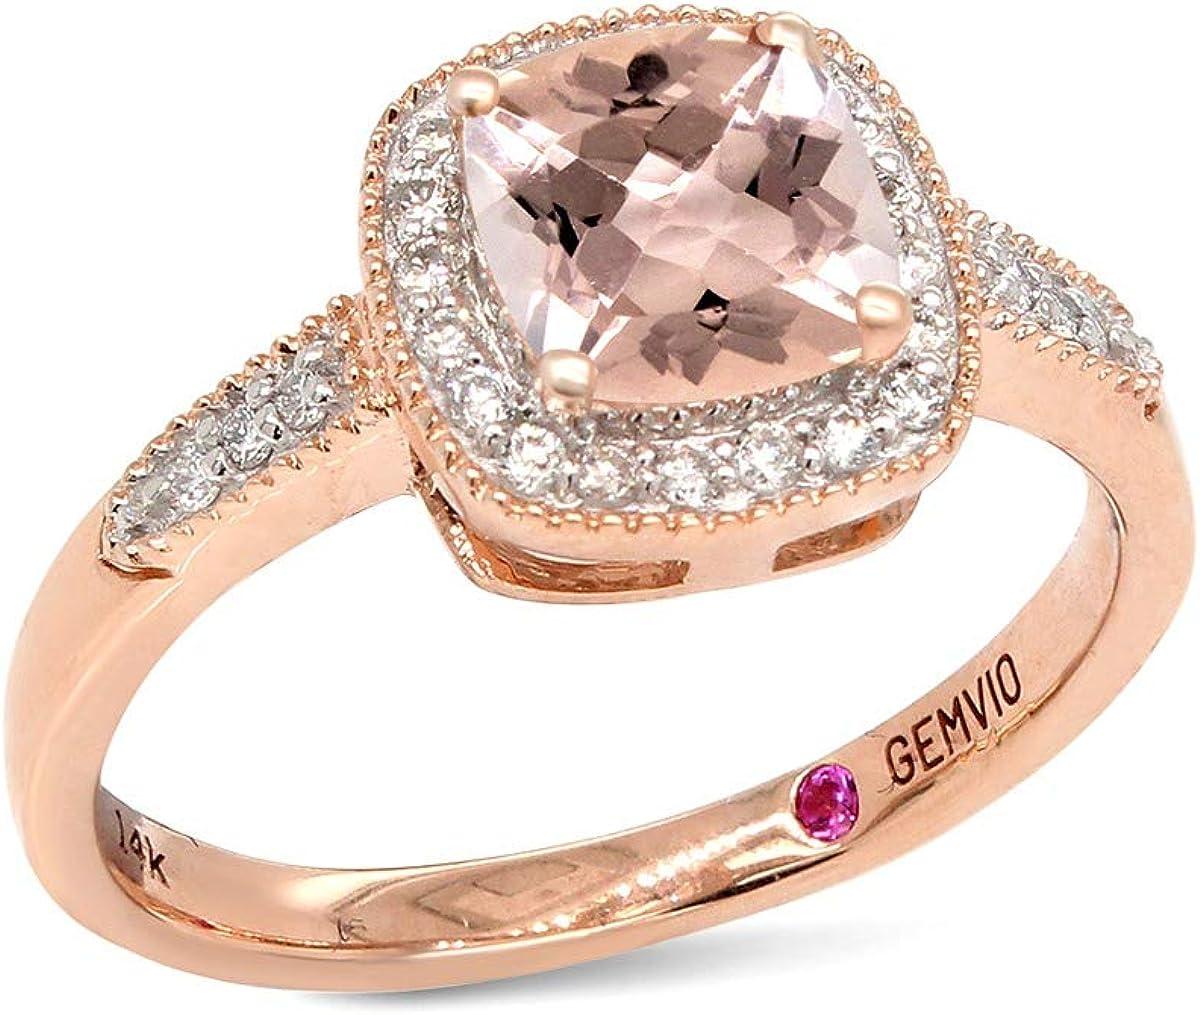 GEMVIO Collection Blush Cushion 6MM Morganite Halo Solitaire Gemstone & Diamond in 14k Gold Engagement Promise Statement Anniversary Wedding Ring